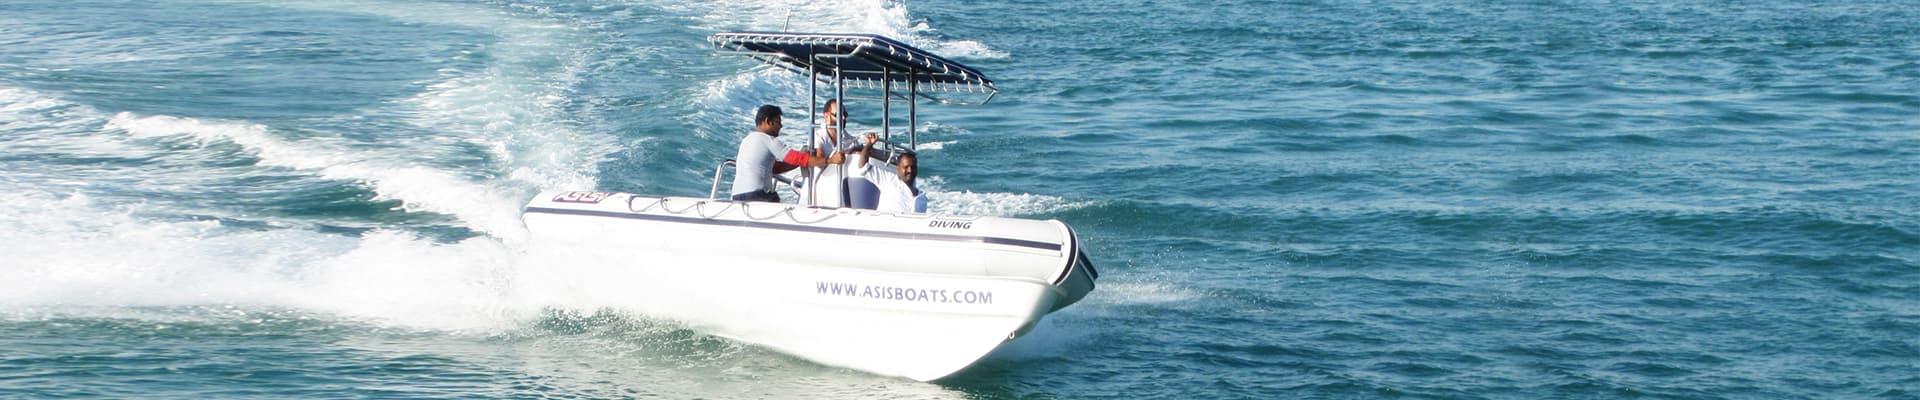 marina-operations-support-boats